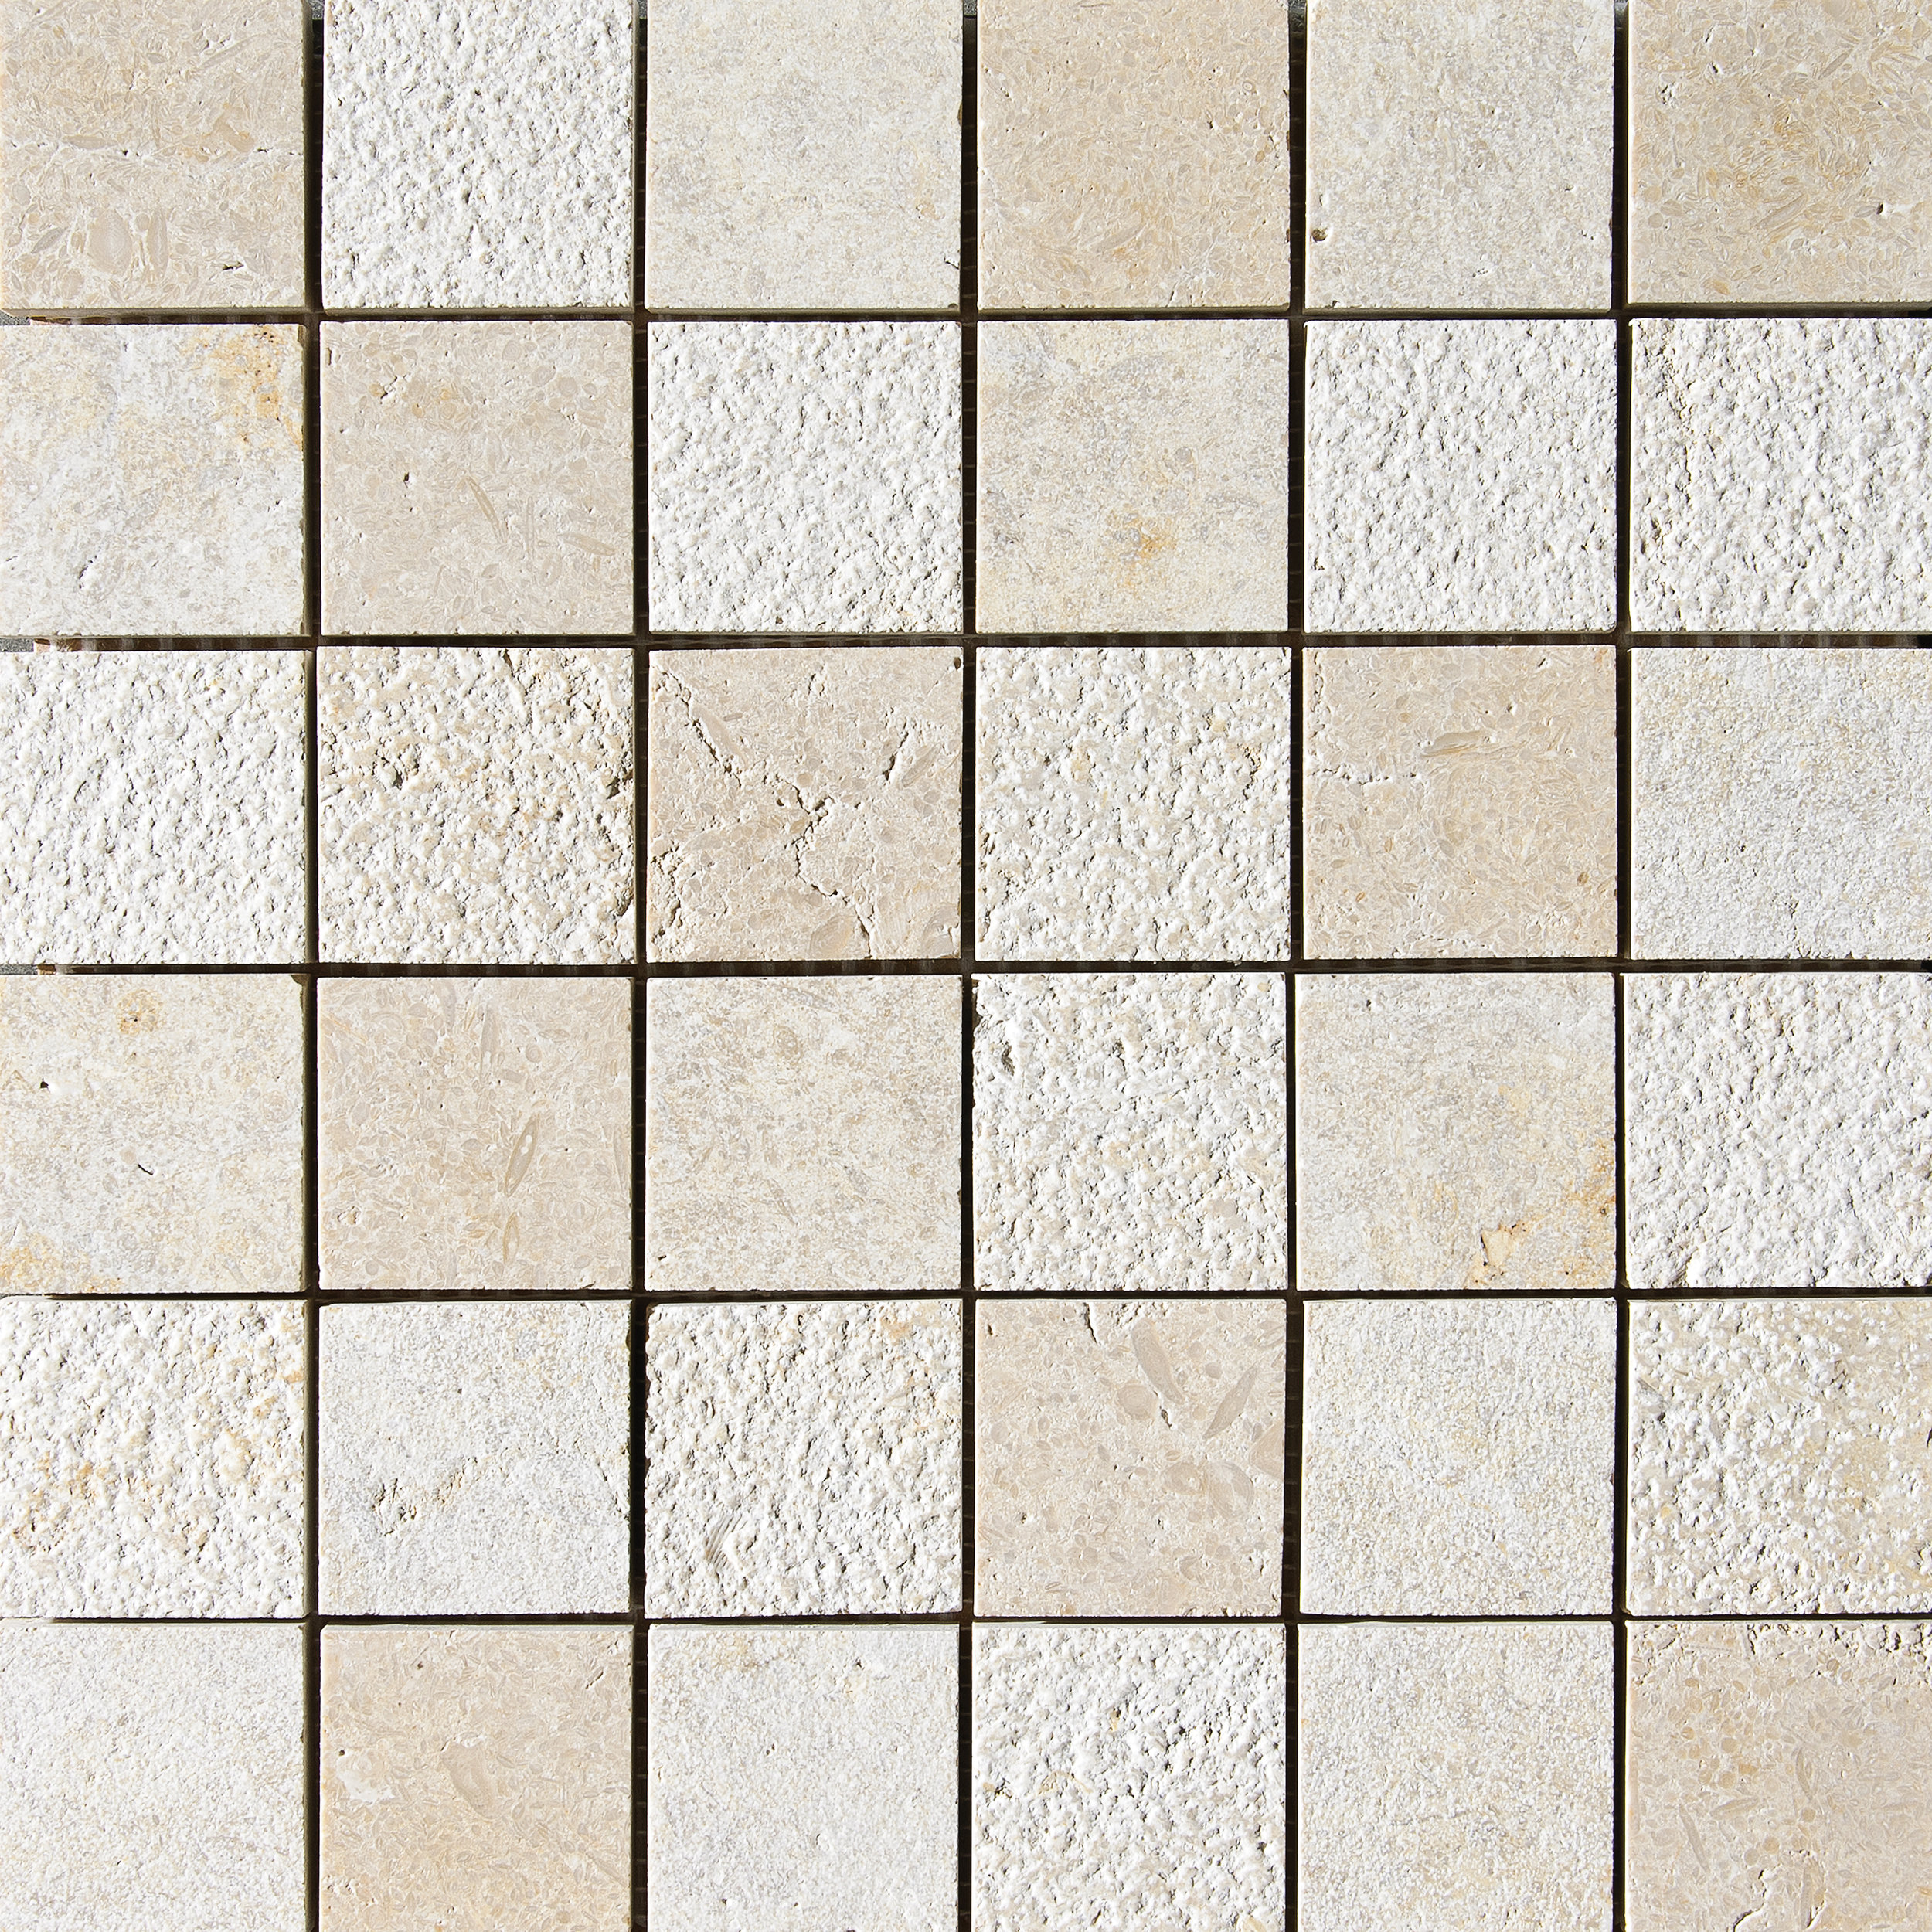 "MS01307 seashell 2""x2"" textured mosaic 12""x12""x3/8"" sheets"